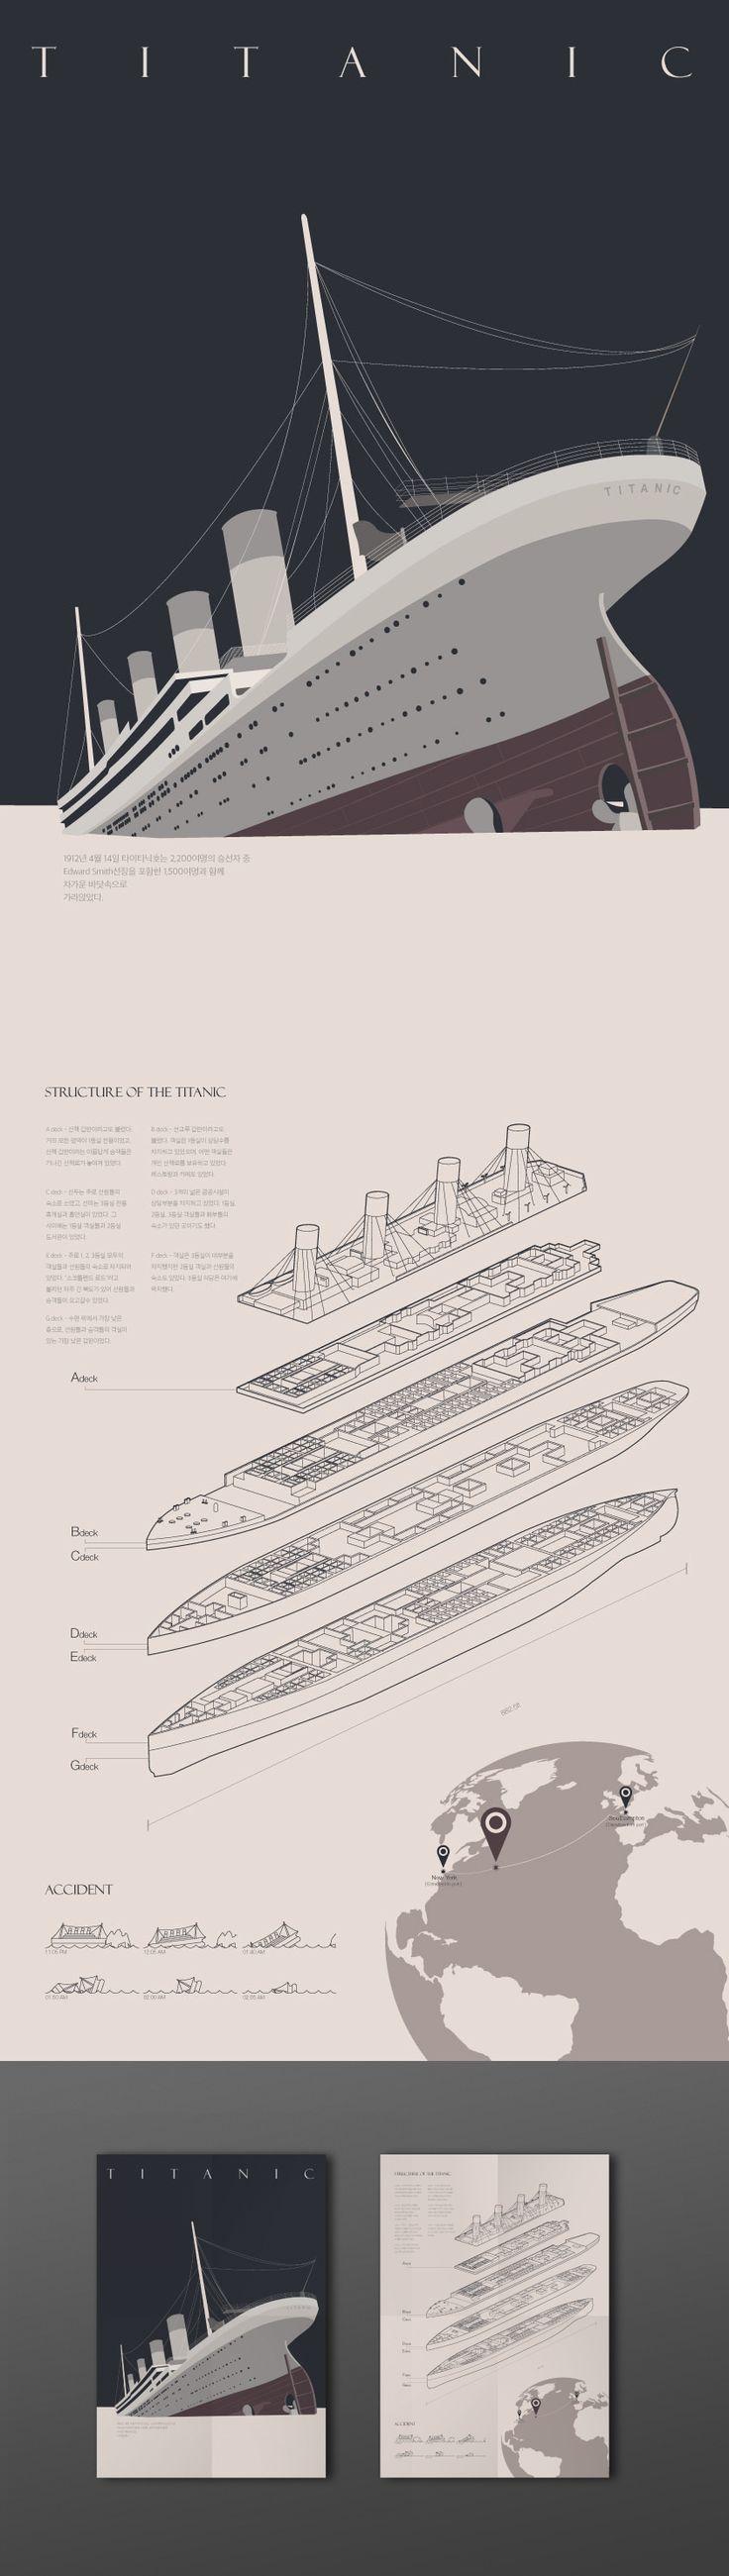 TITANIC 1912 _Infographic on Behance